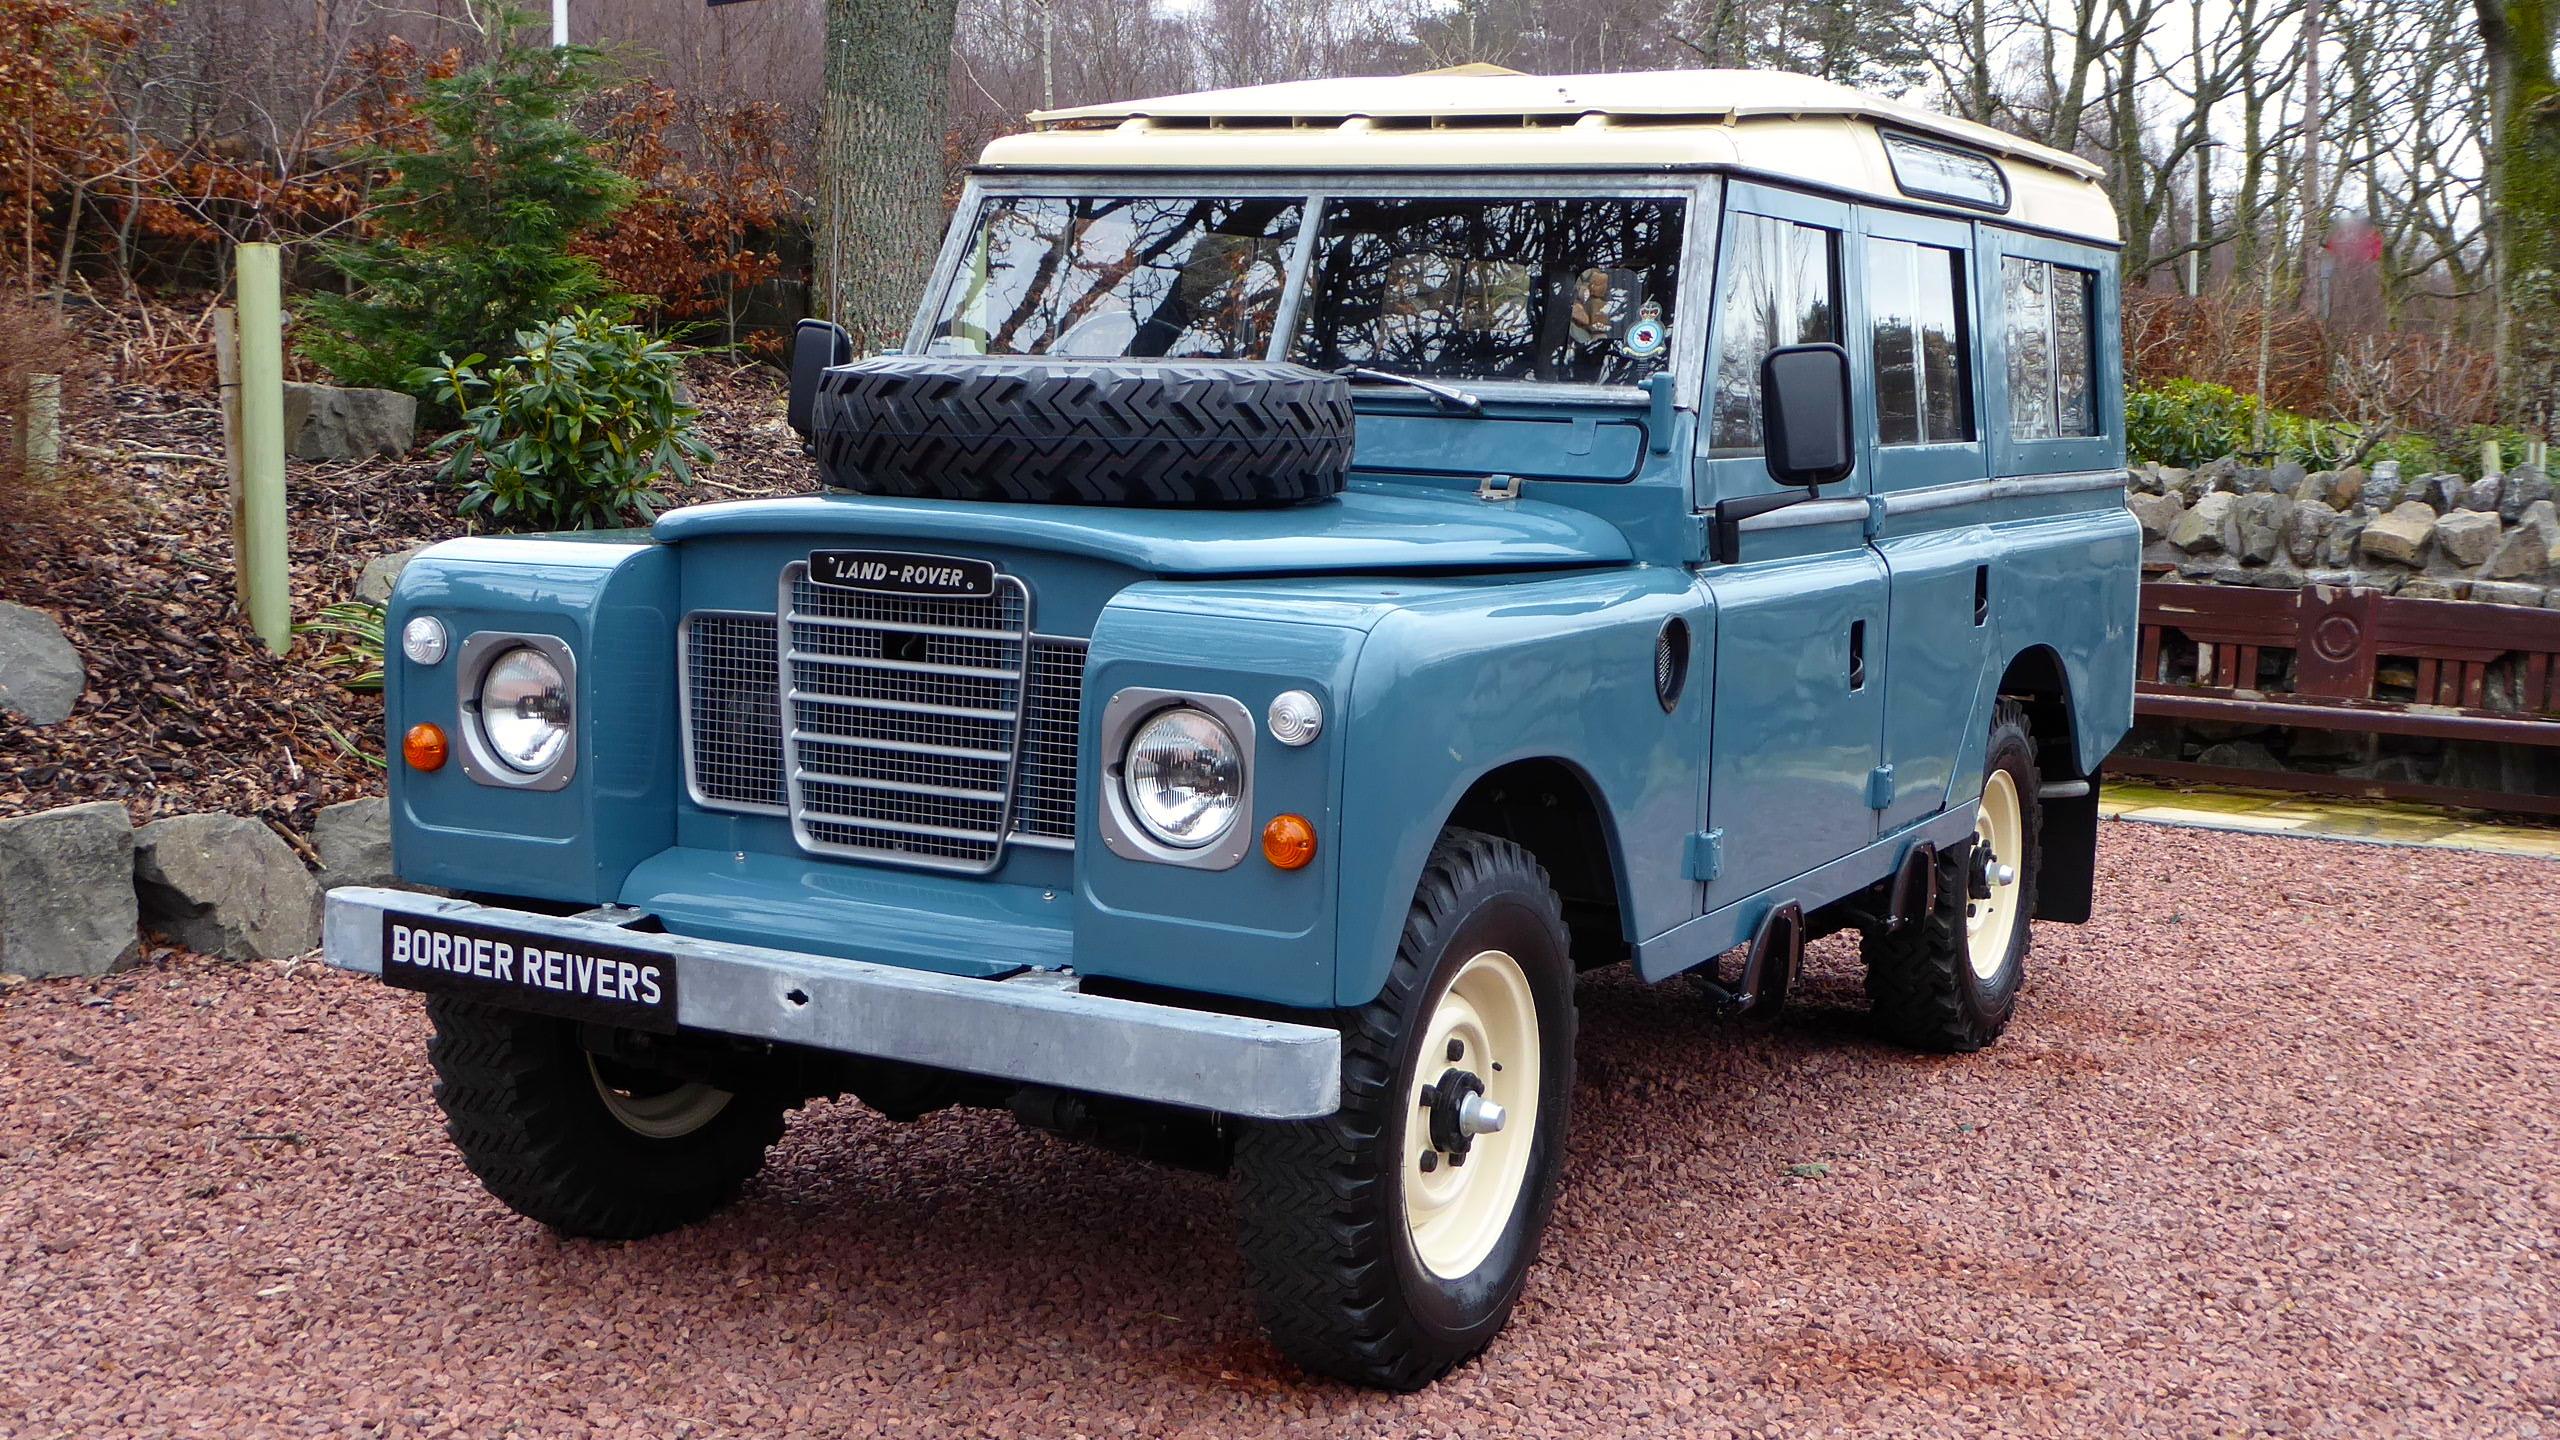 Land Rover Safari S3 Border Reivers